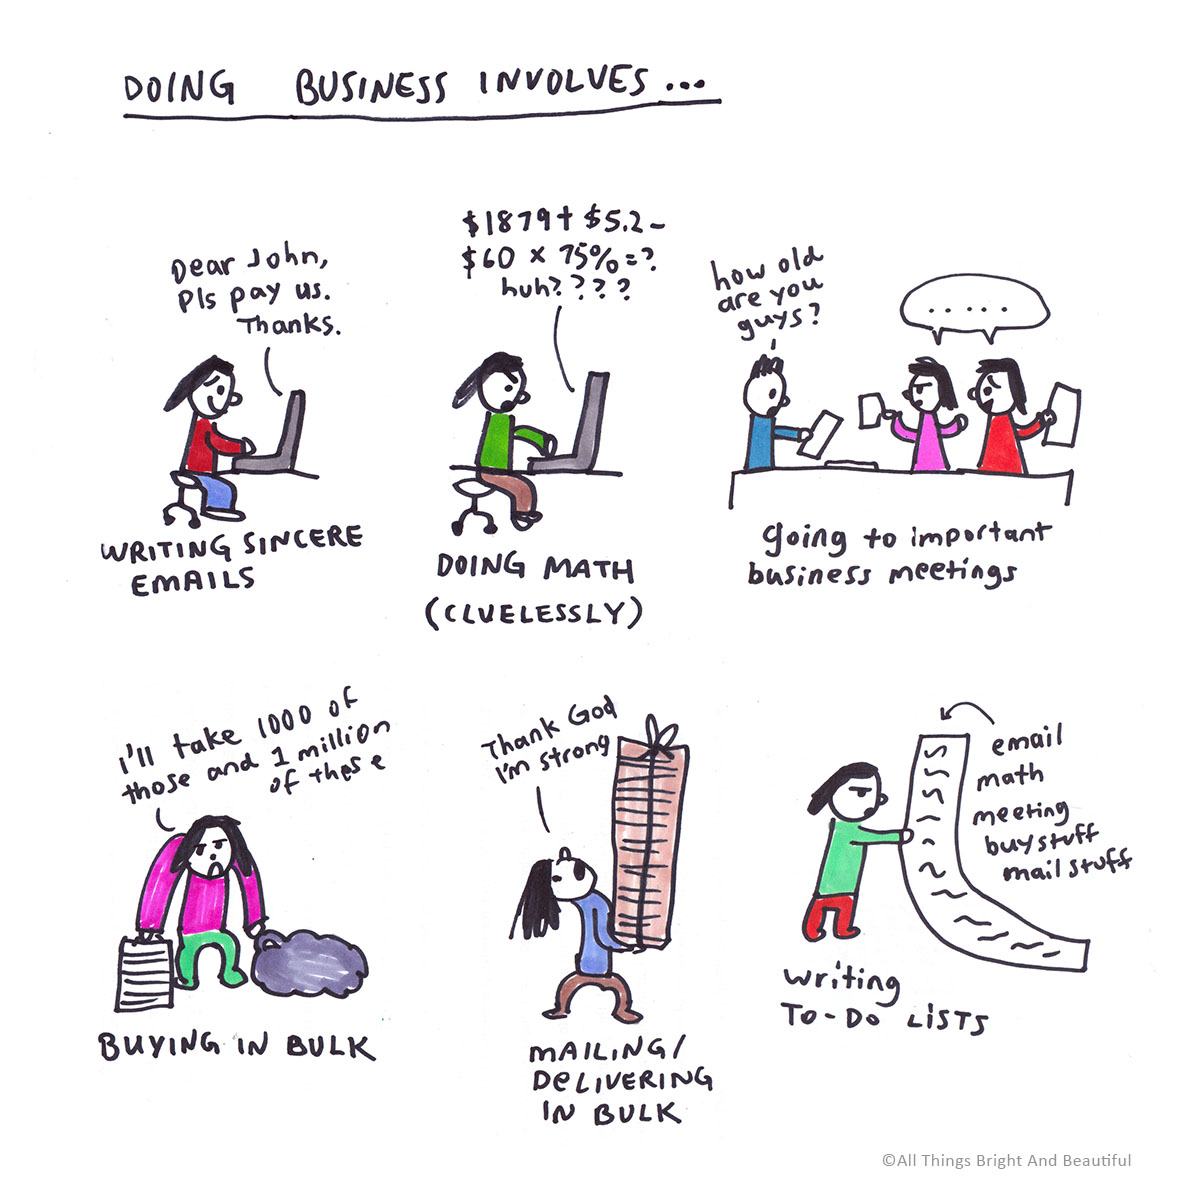 Doing business involves…  創業包括了做很多很多事...